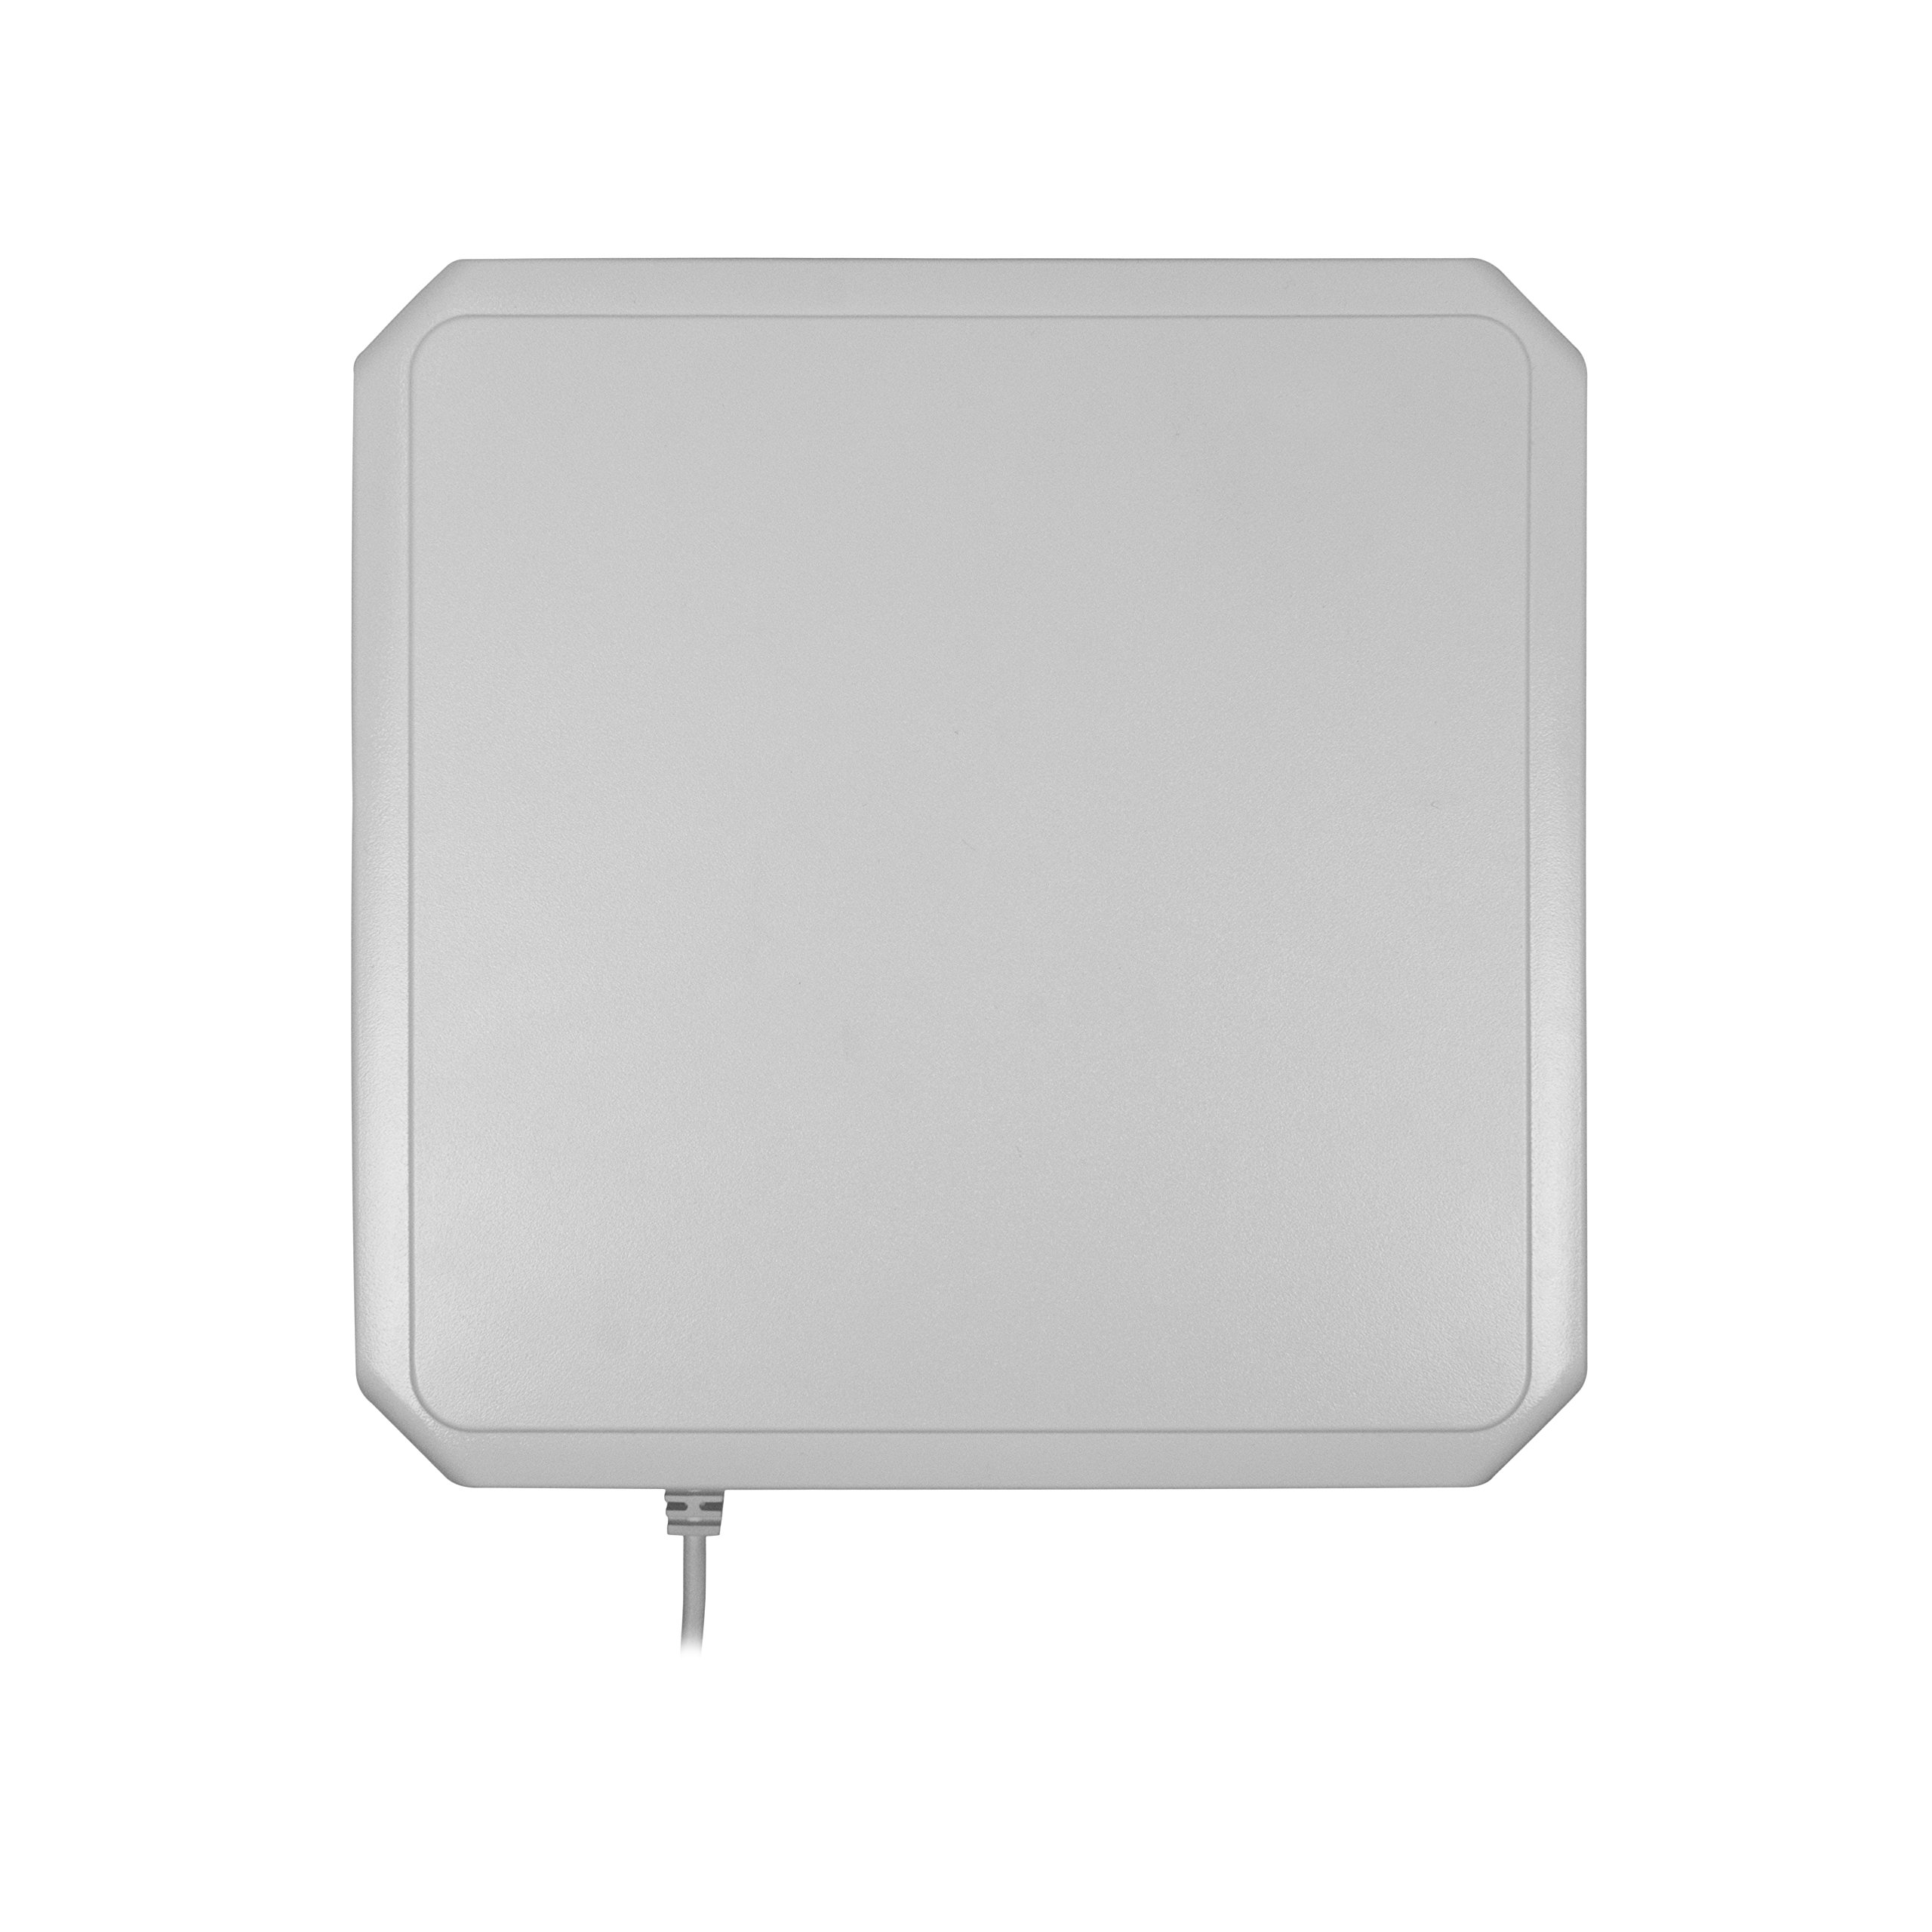 Laird S9028PCR (RHCP) Indoor RFID Antenna (902-928 MHz)